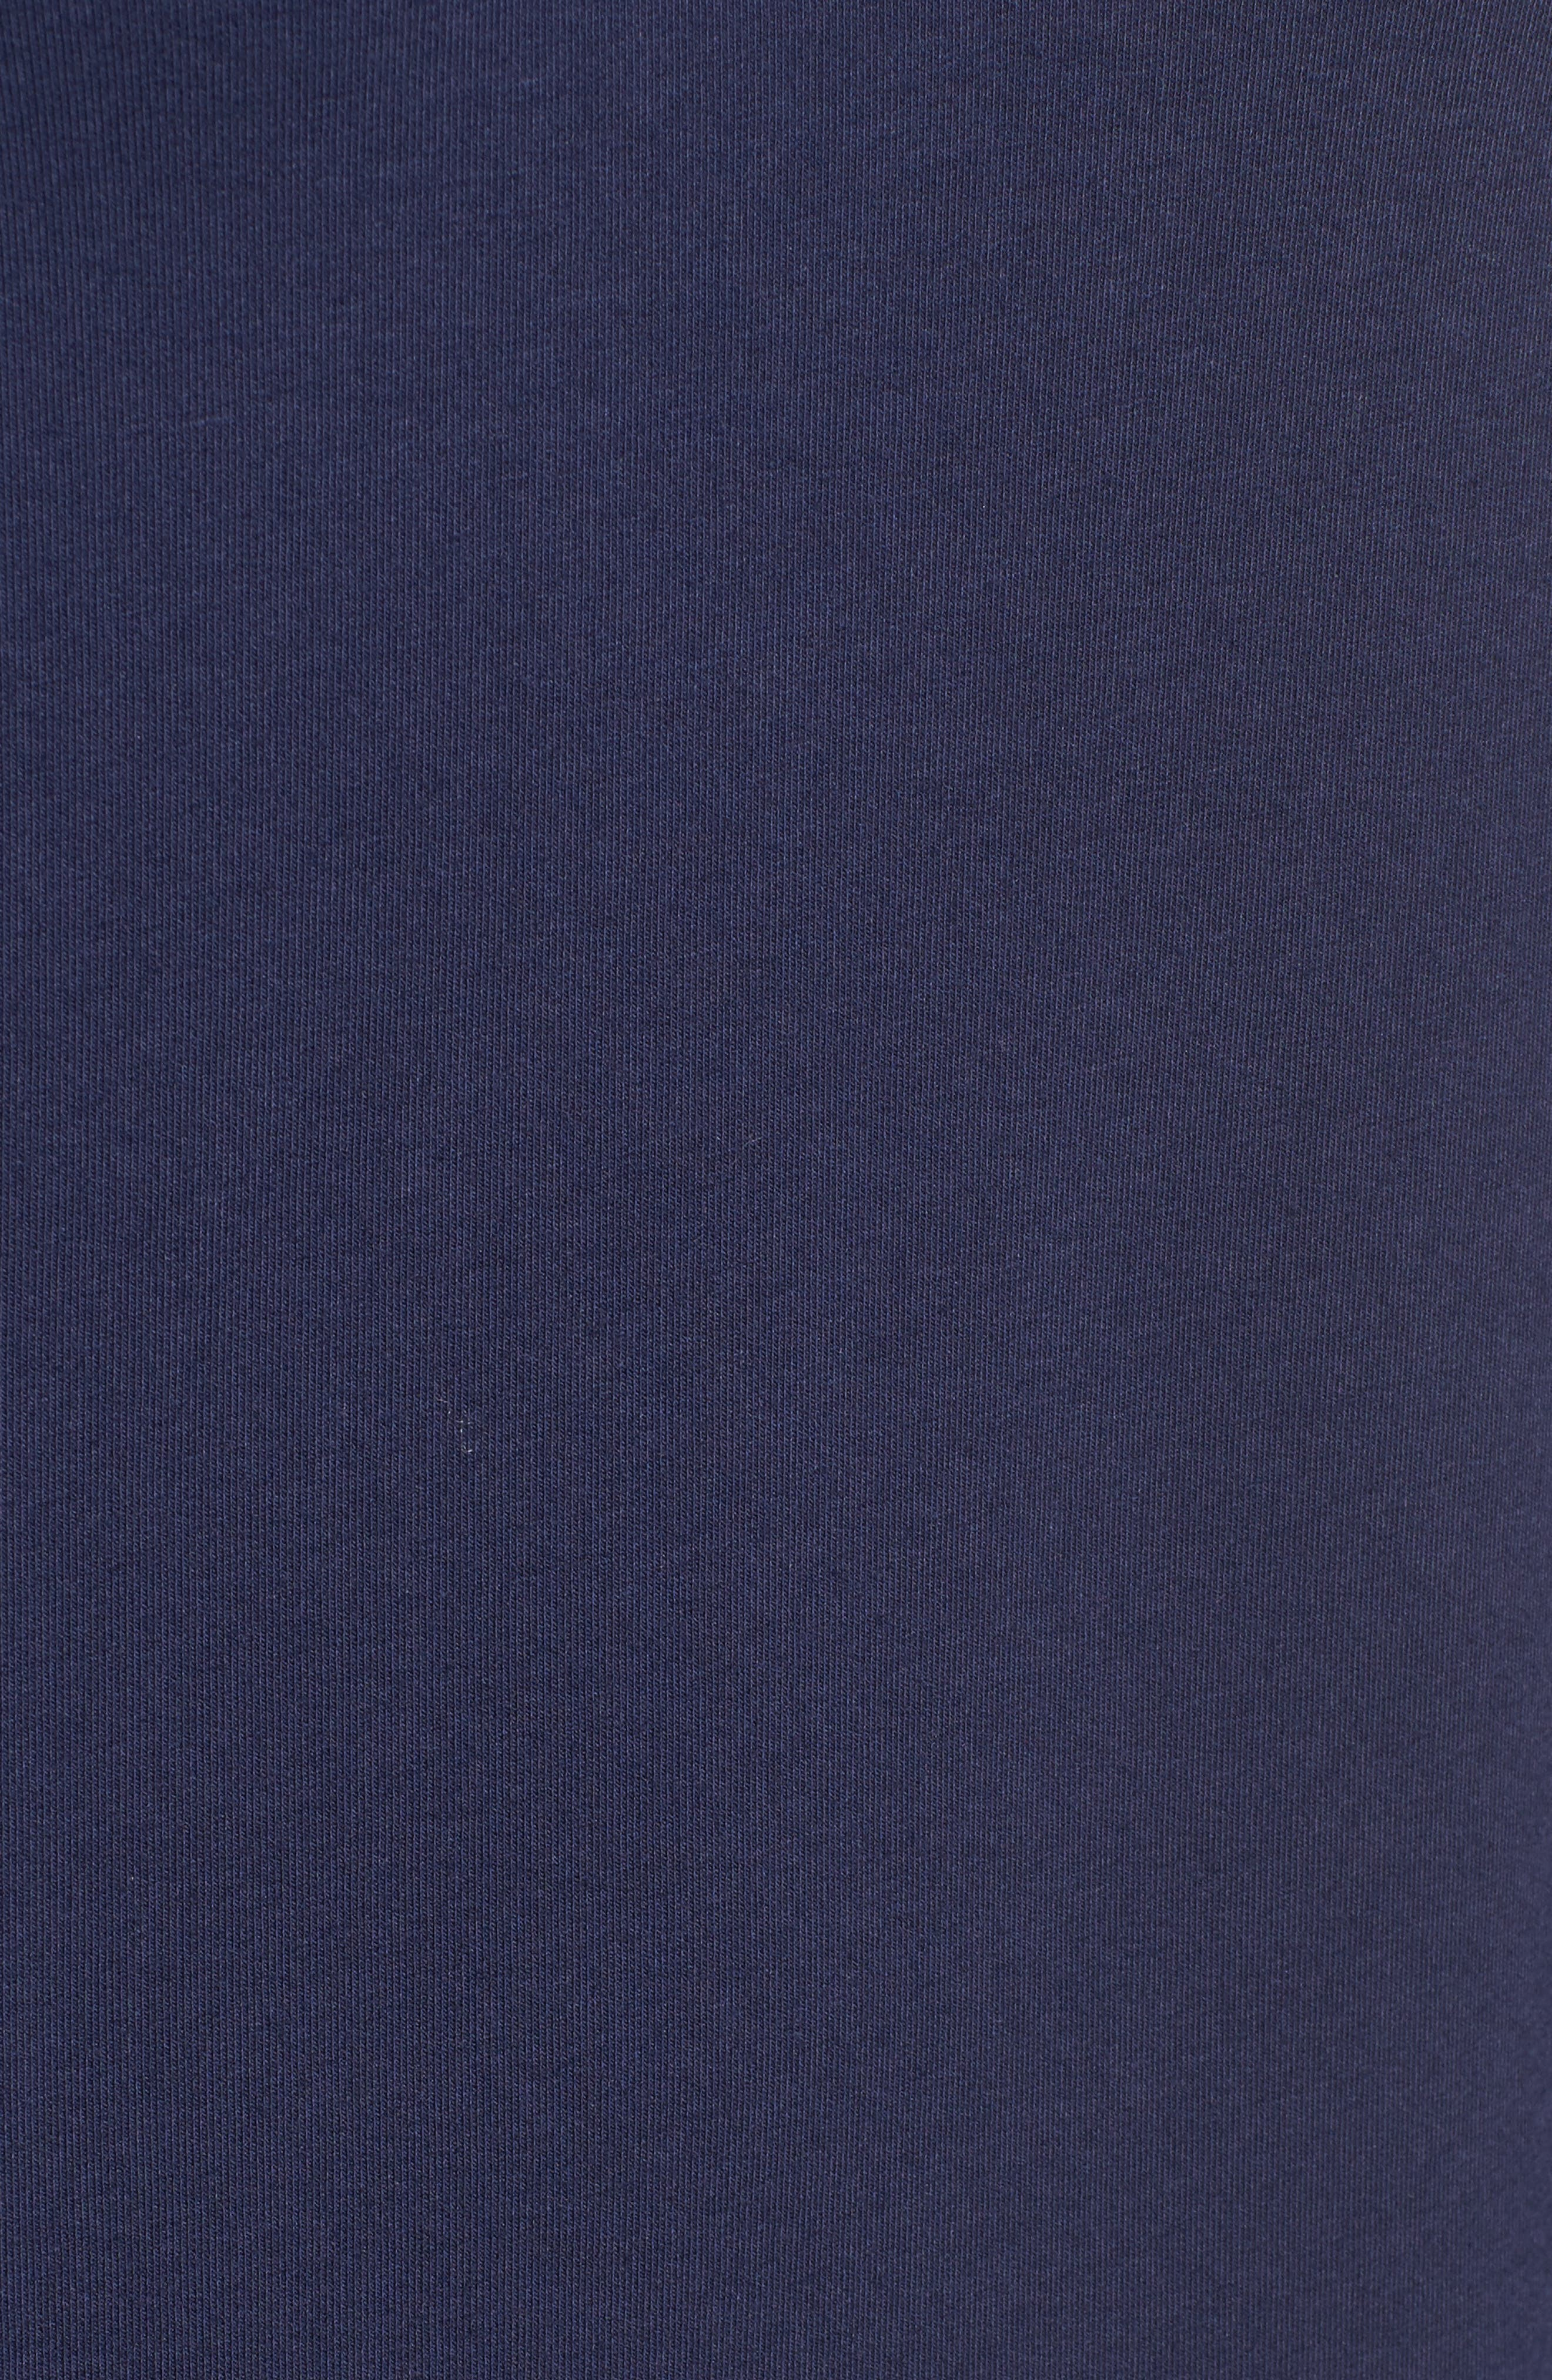 Ruffle Detail Knit Dress,                             Alternate thumbnail 15, color,